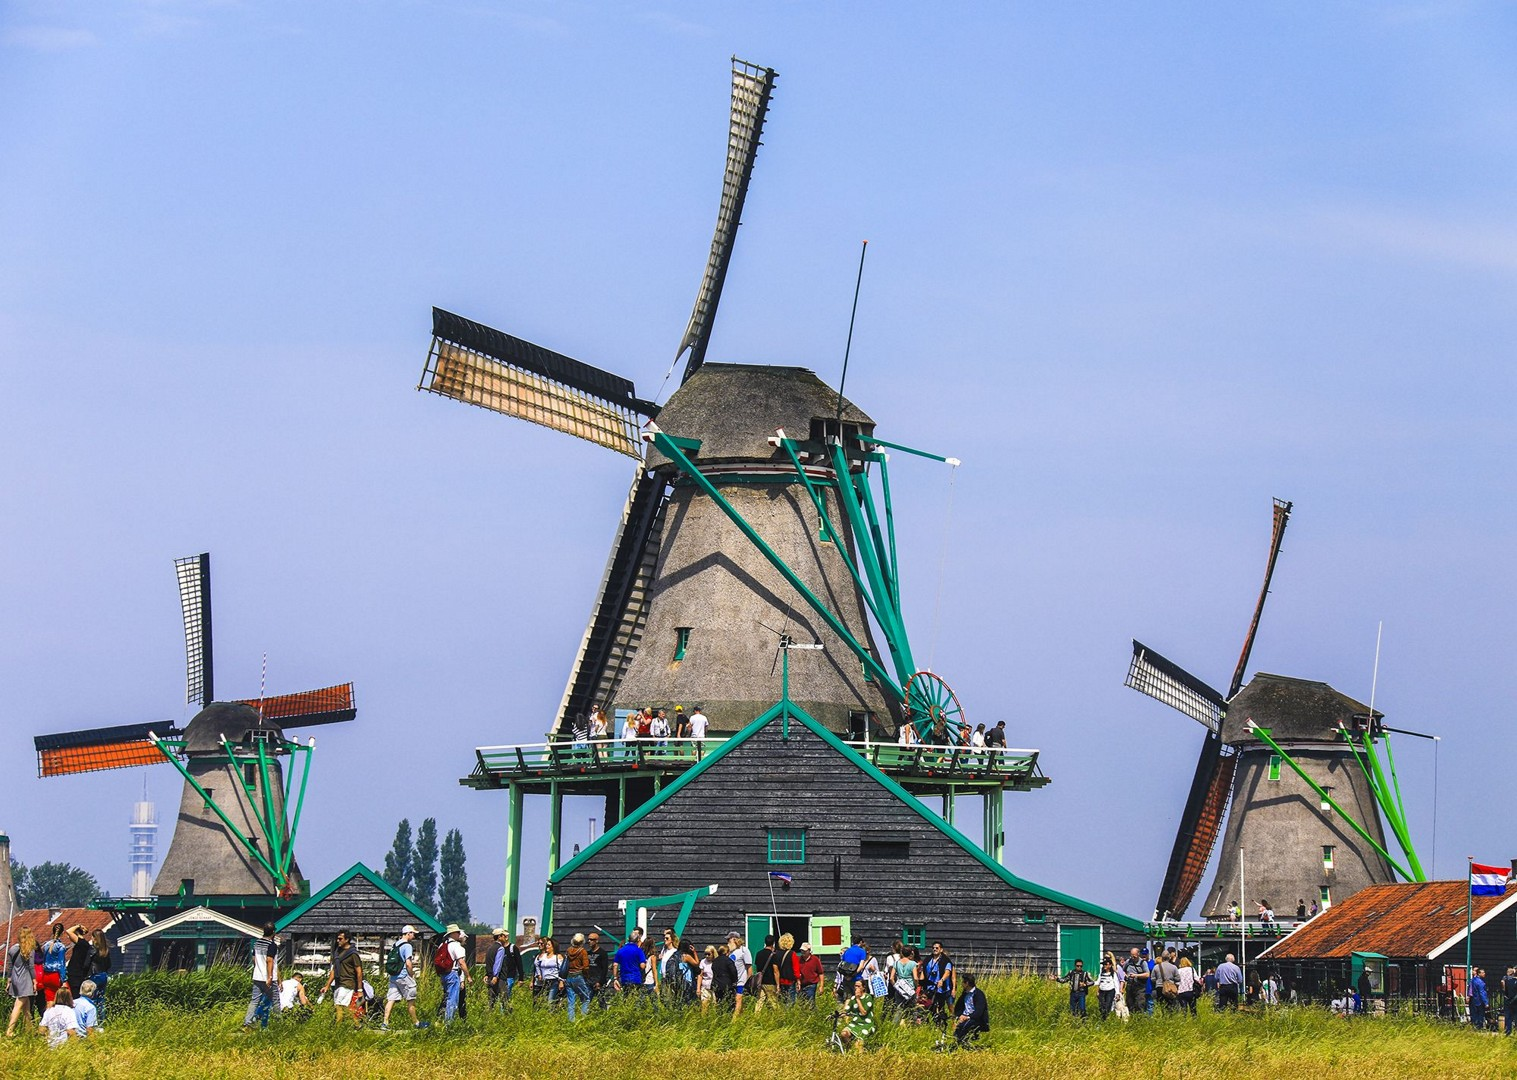 zaanse-schans-zaandam-holland-amsterdam-windmills-family-cycling-self-guided.jpg - NEW! Holland - Dutch Discoverer - Canals and Castles - Family Cycling